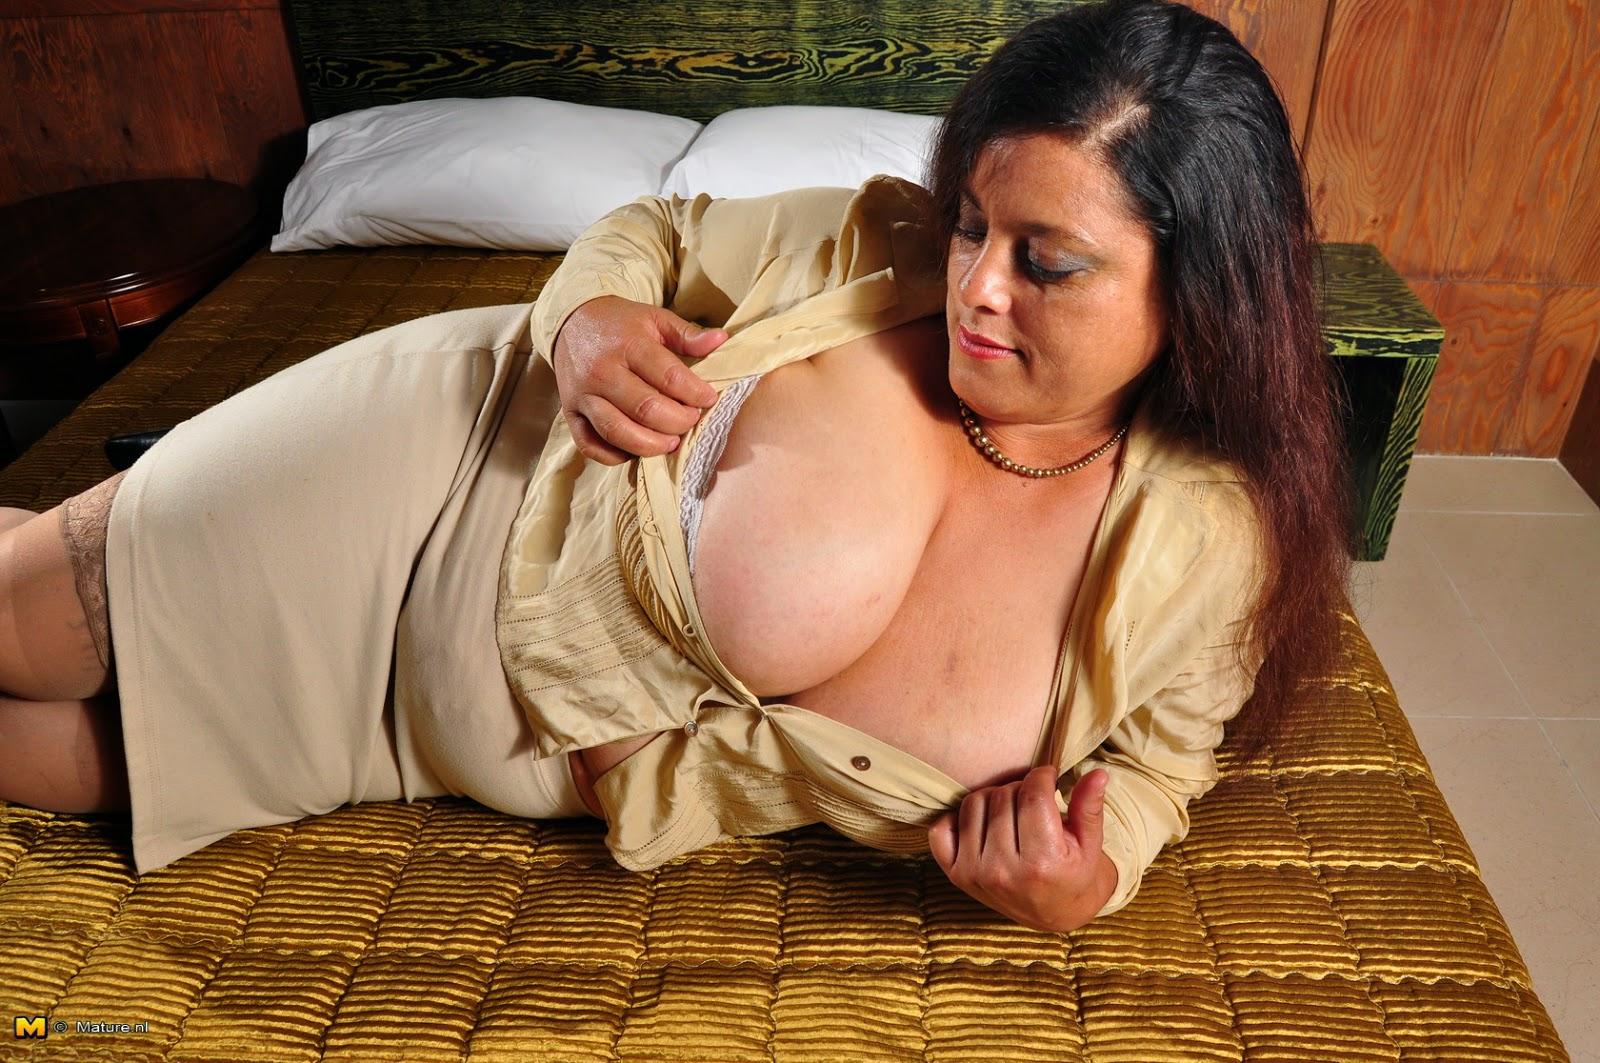 Amanda love shows off her sports bra - 3 part 6